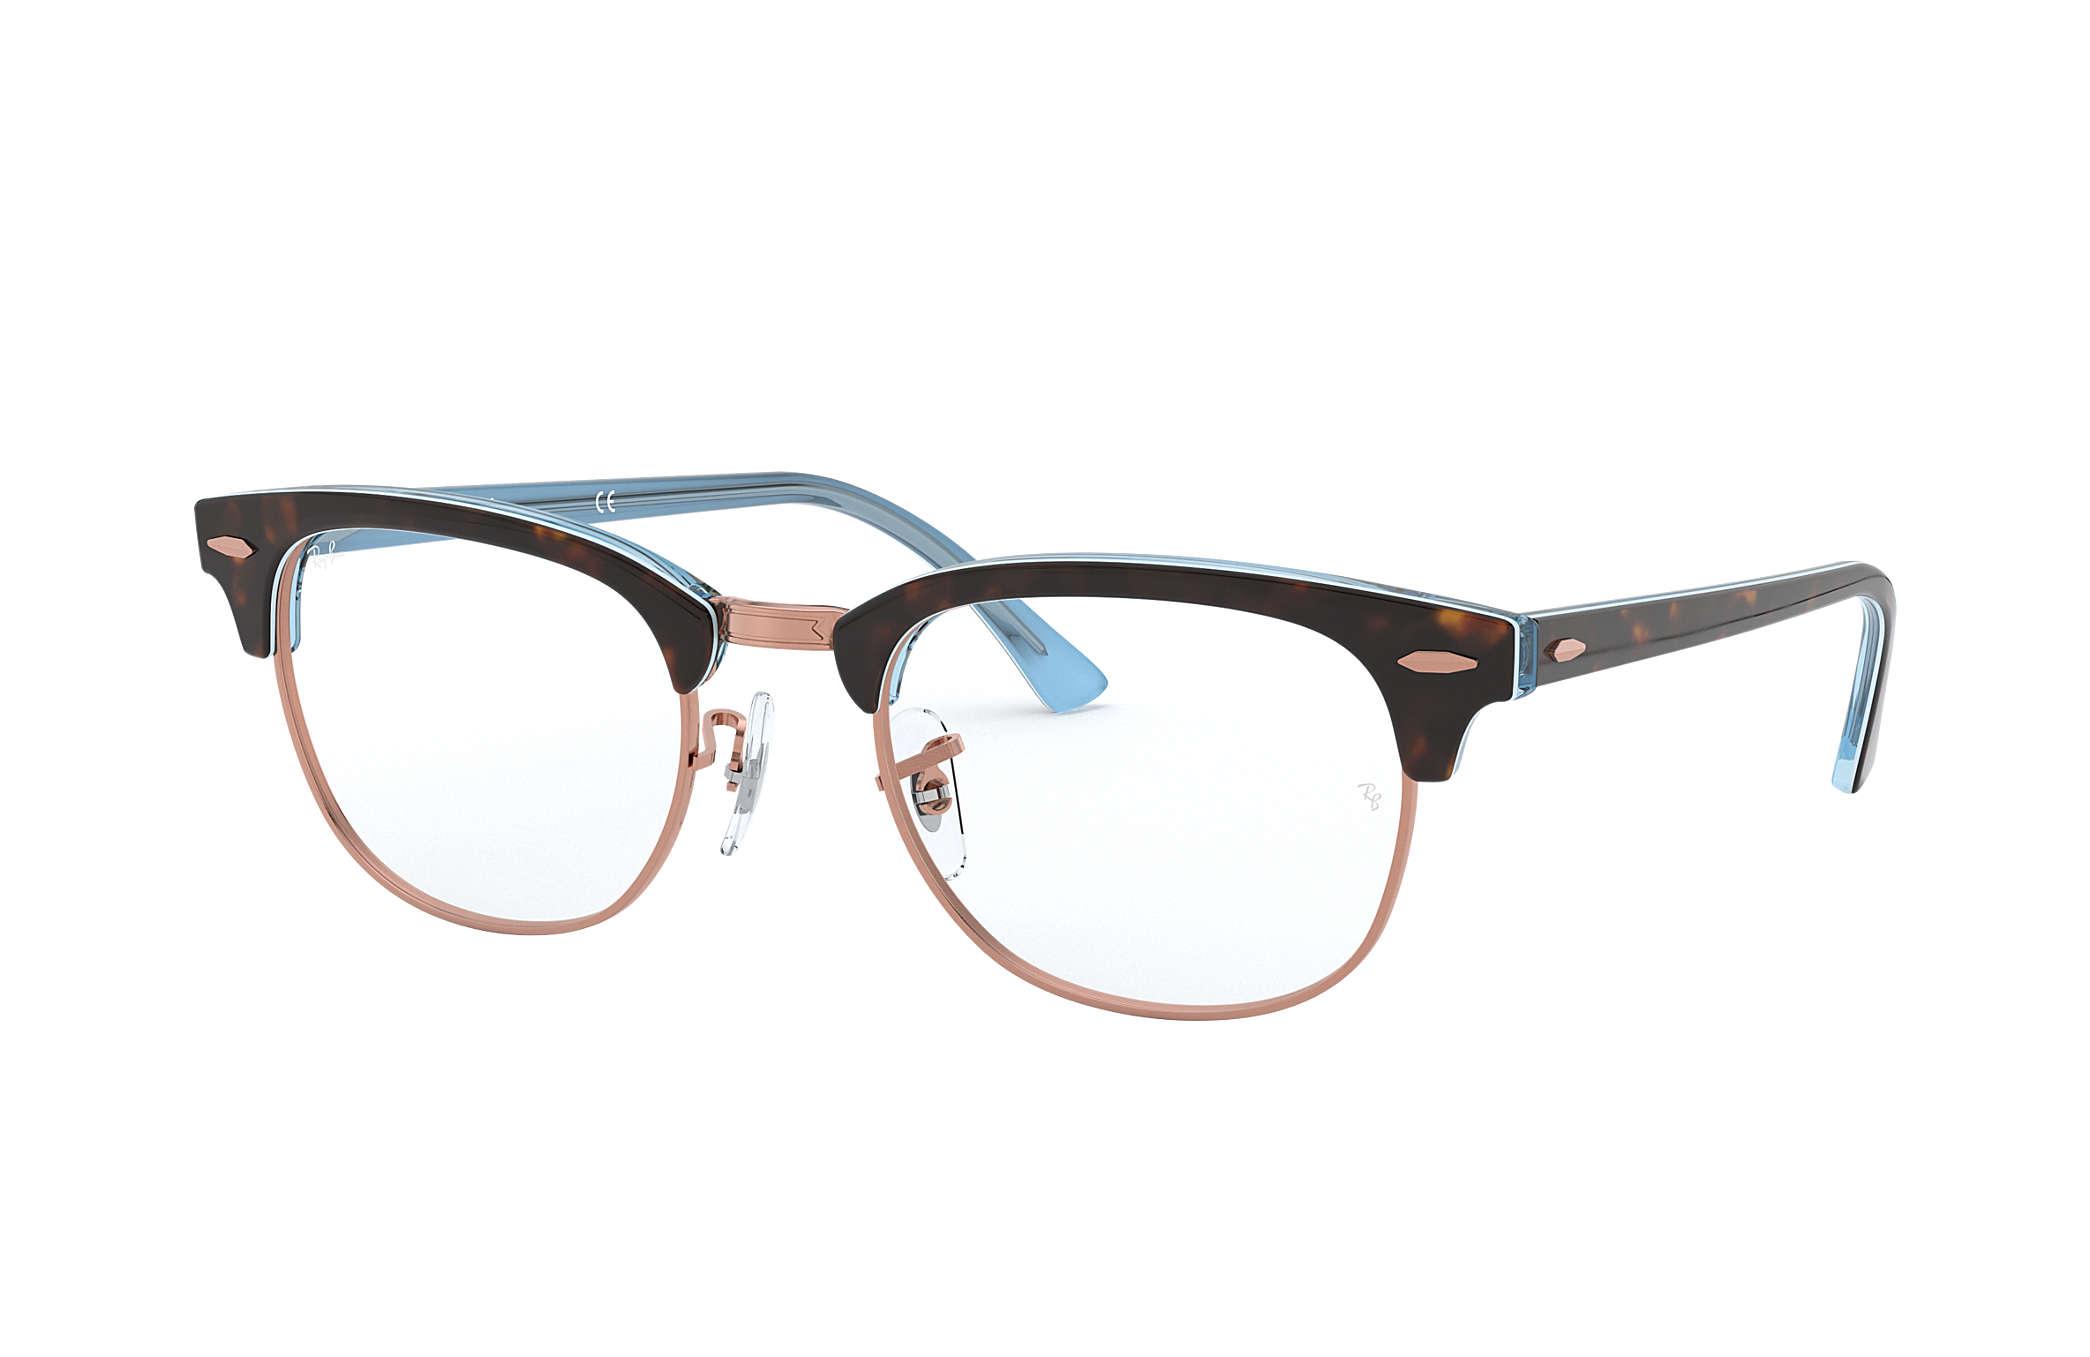 Ray Ban eyeglasses Clubmaster Optics RB5154 Tortoise